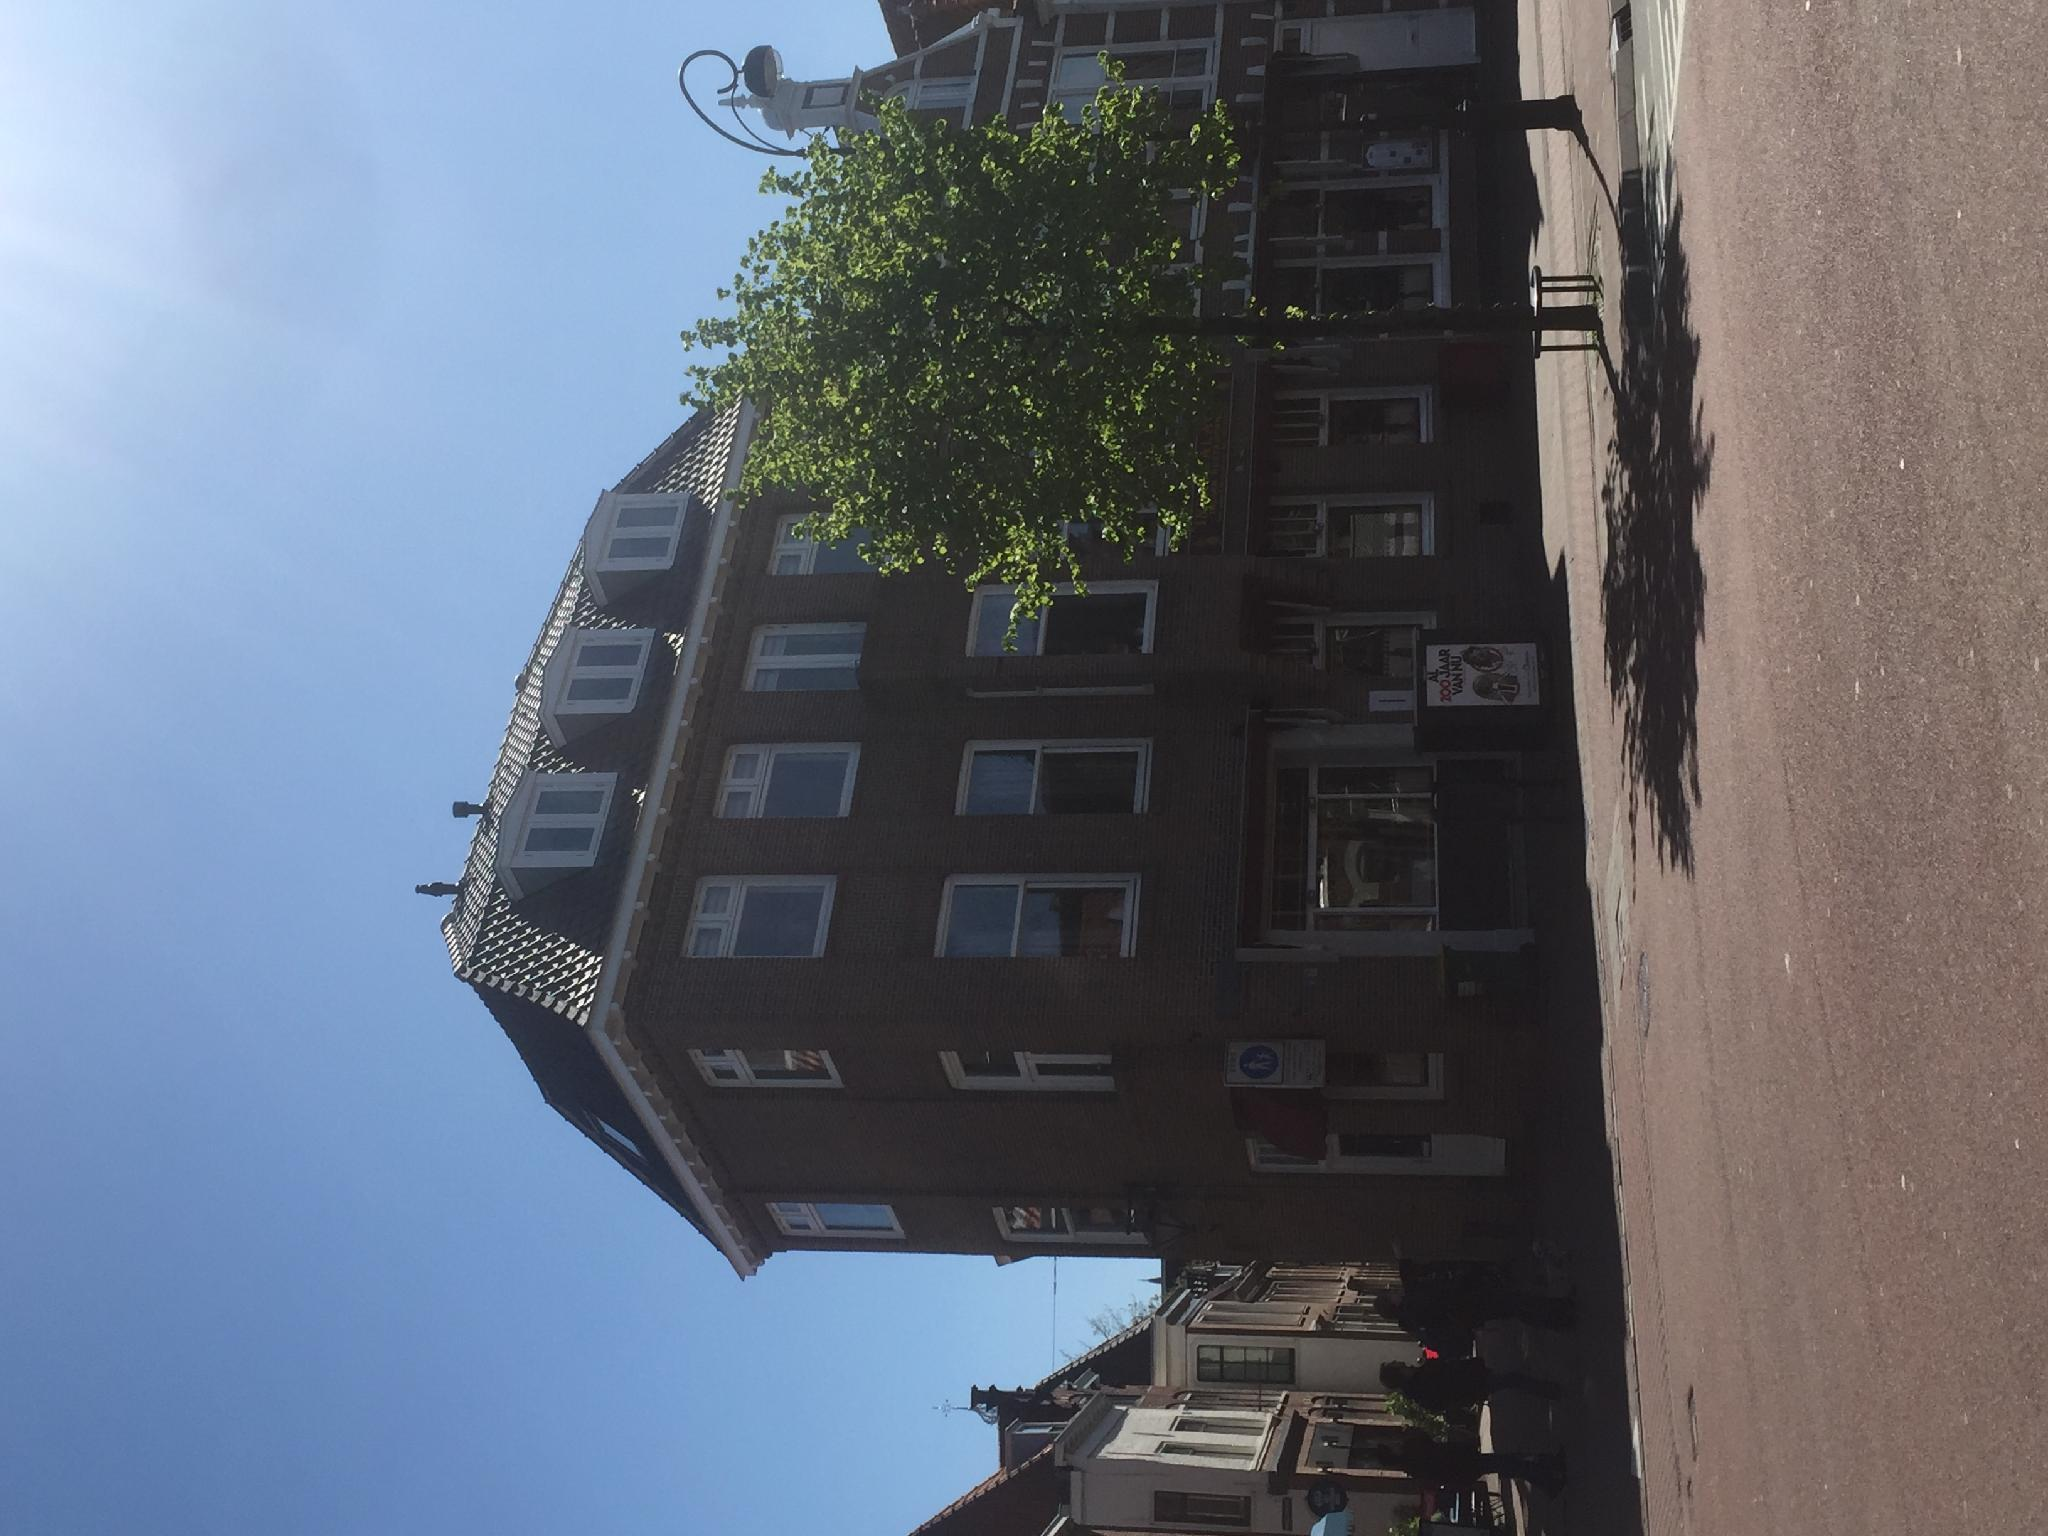 GOG Cozy Lofts Haarlem   F